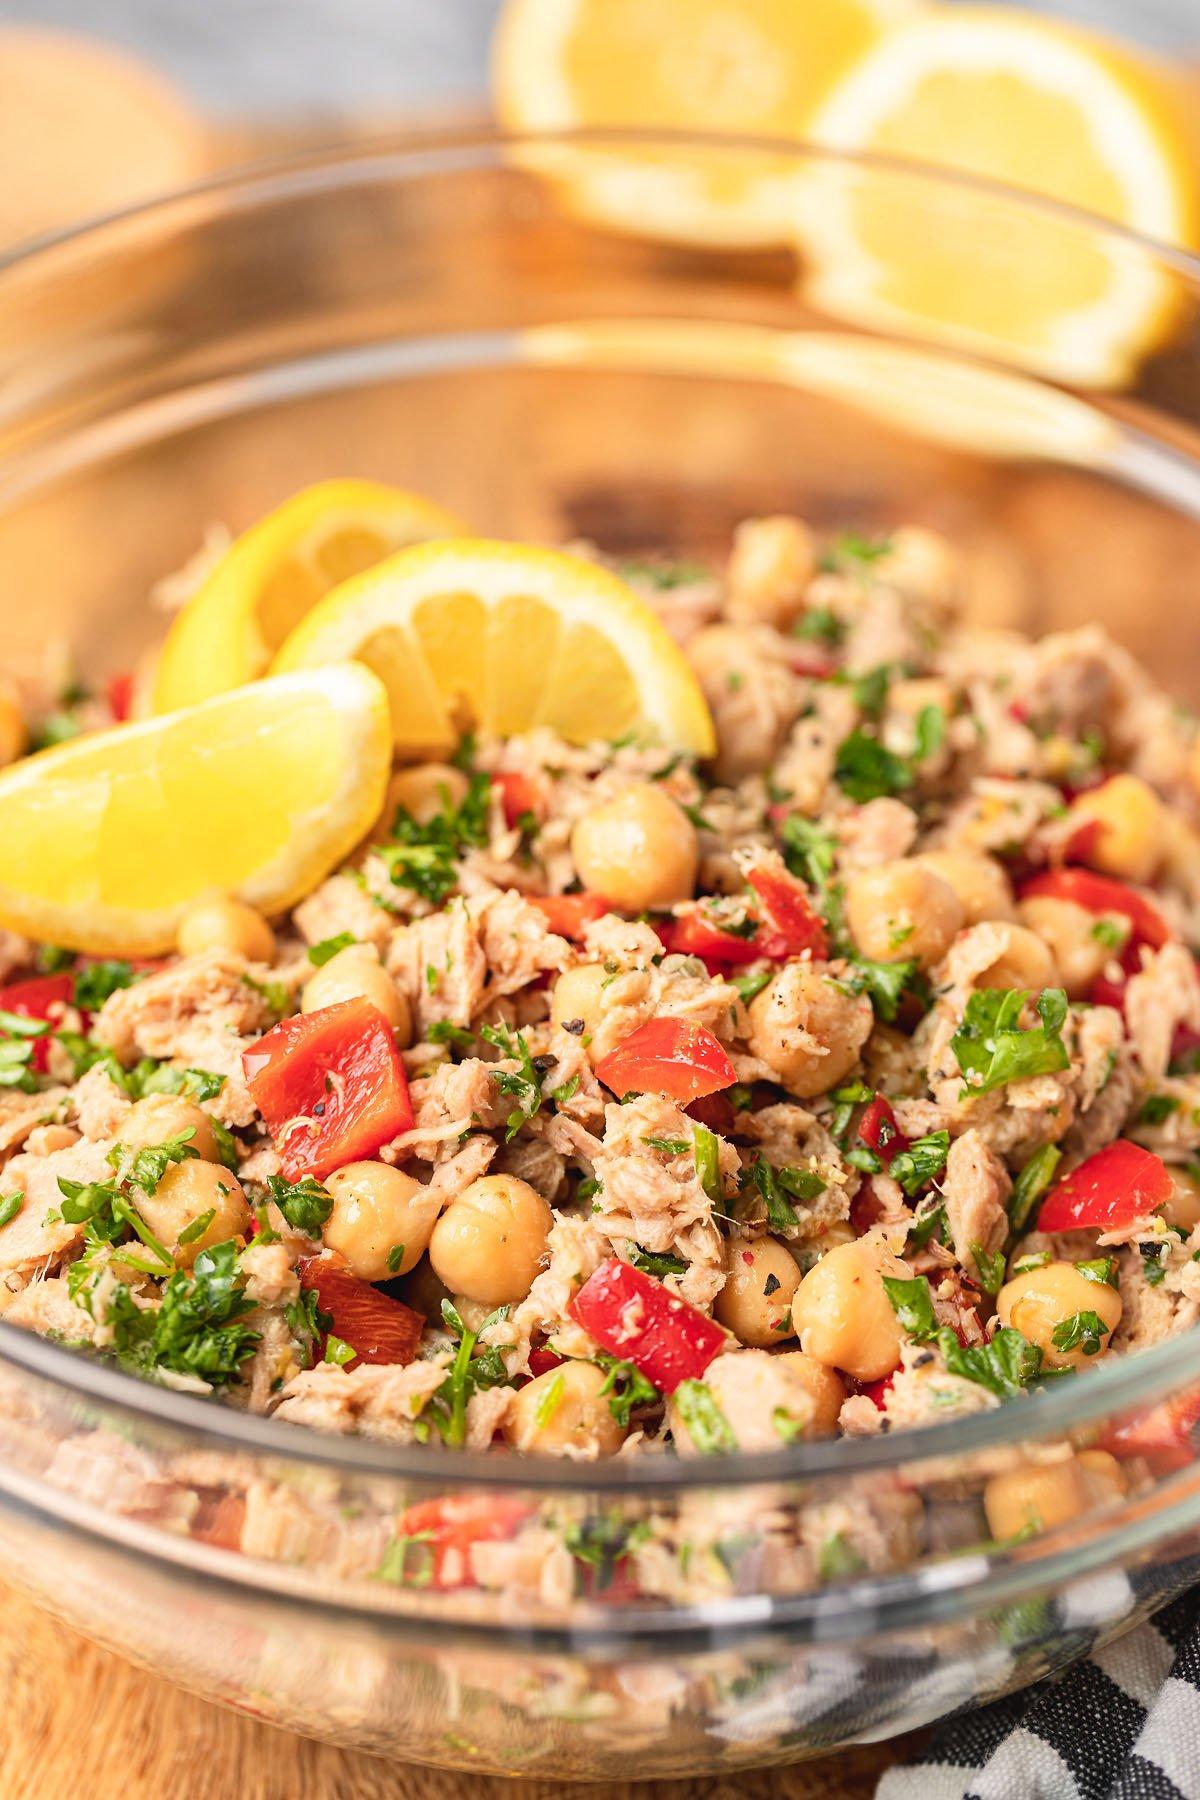 chickpea tuna salad in a glass bowl with lemon garnish